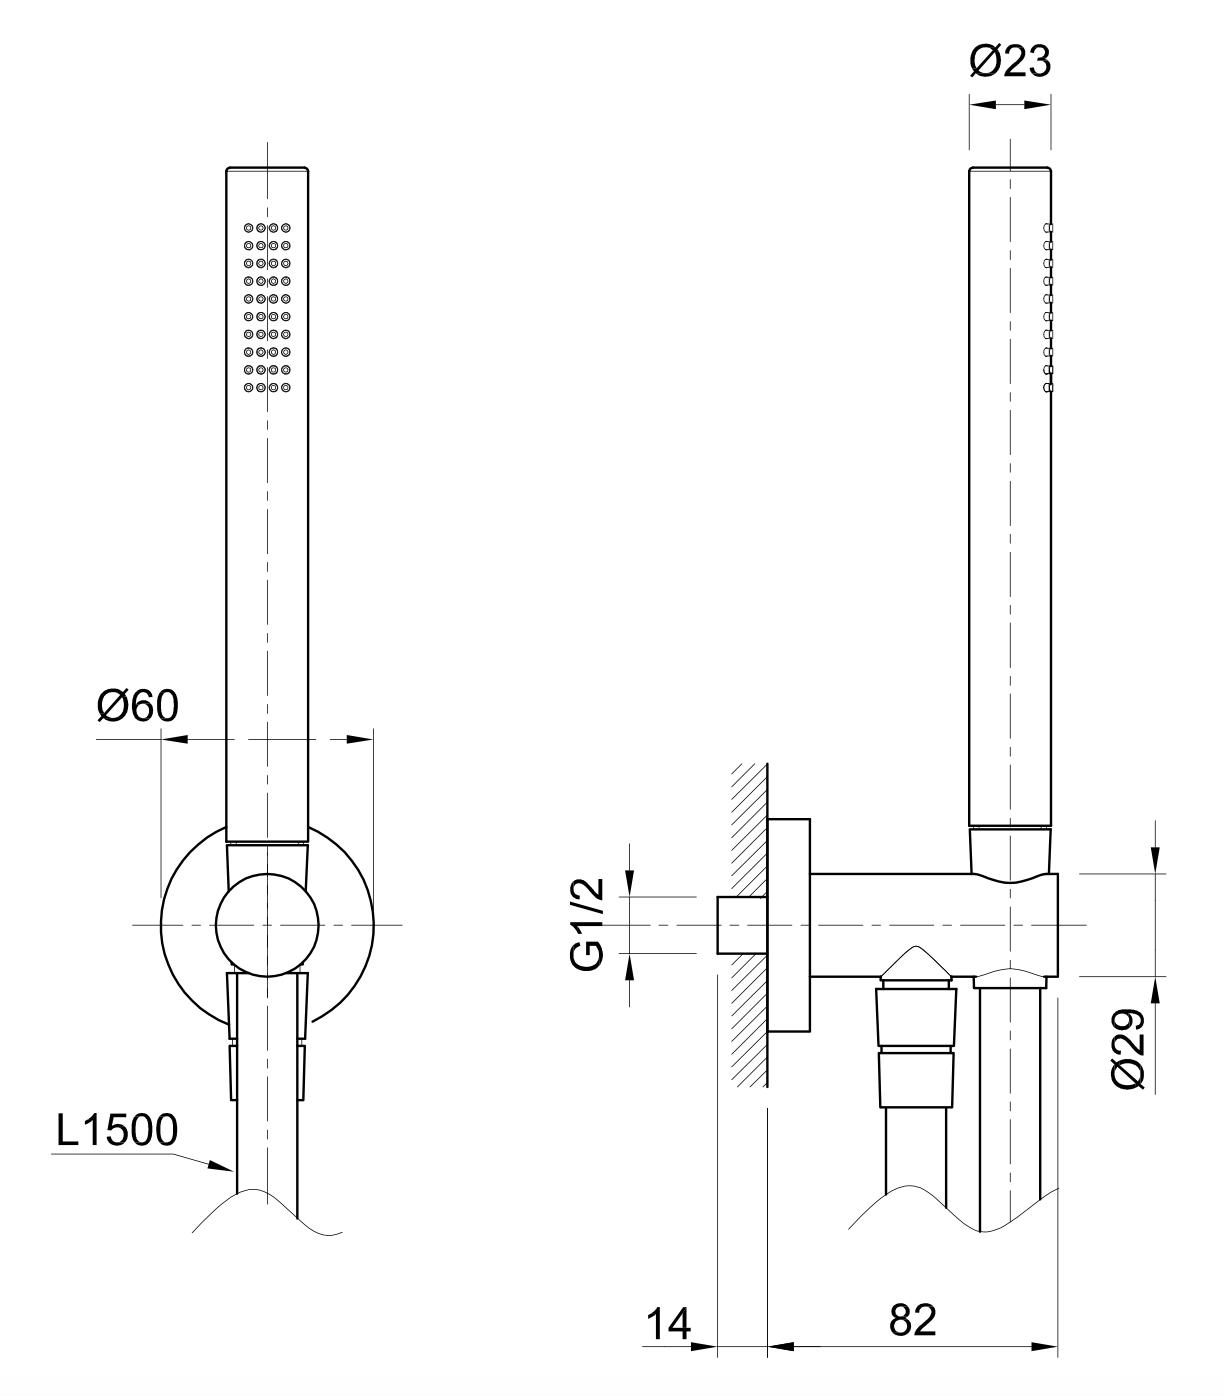 UNDOCOT technical